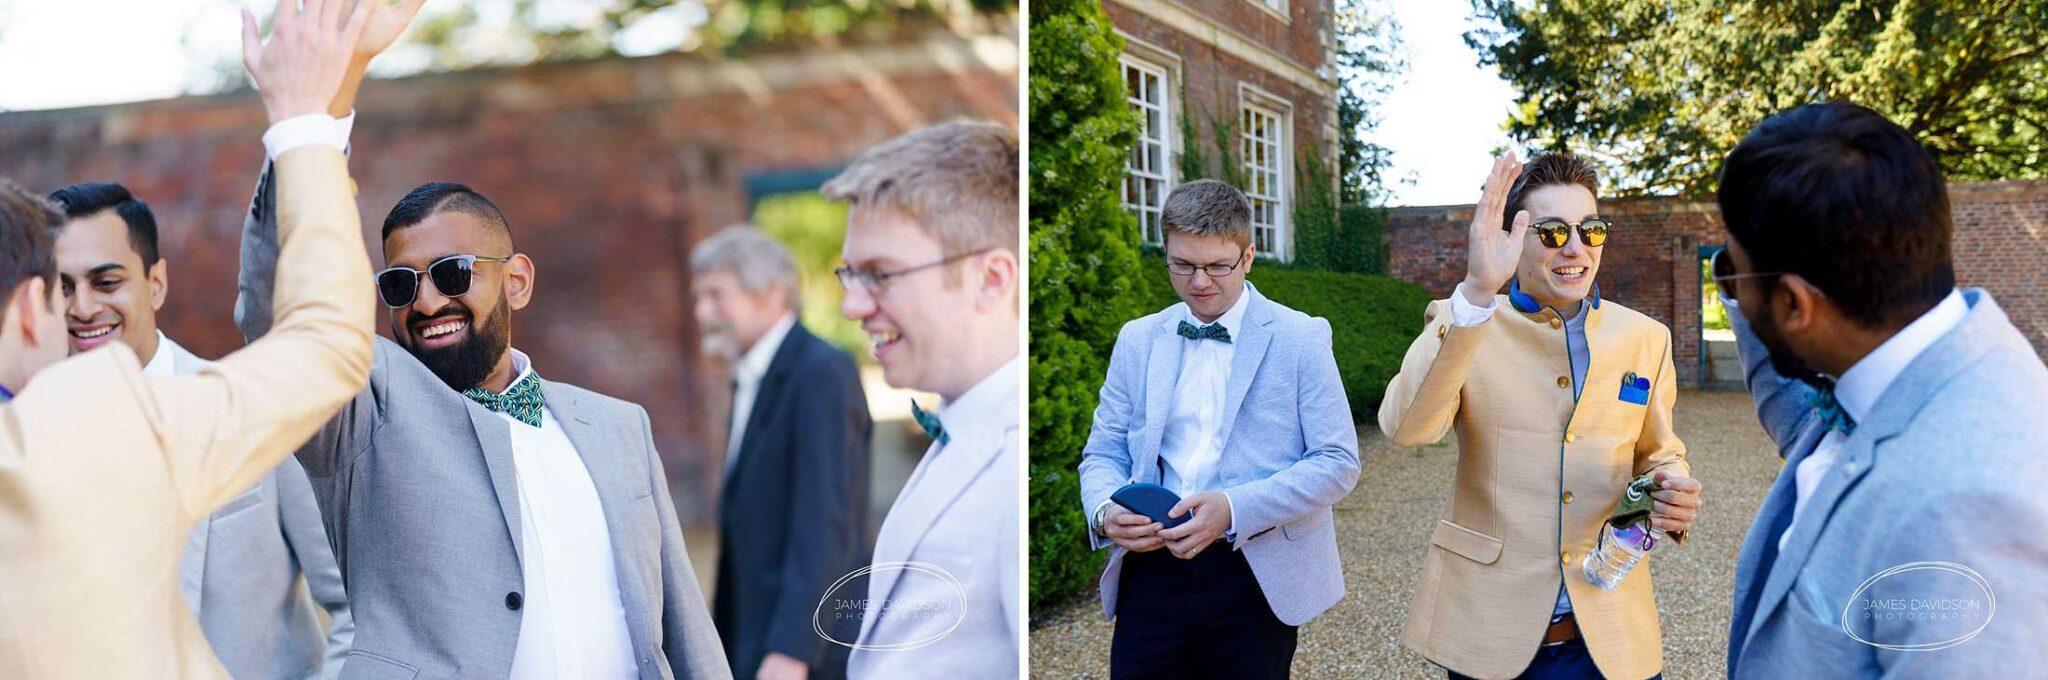 anstey-hall-wedding-021